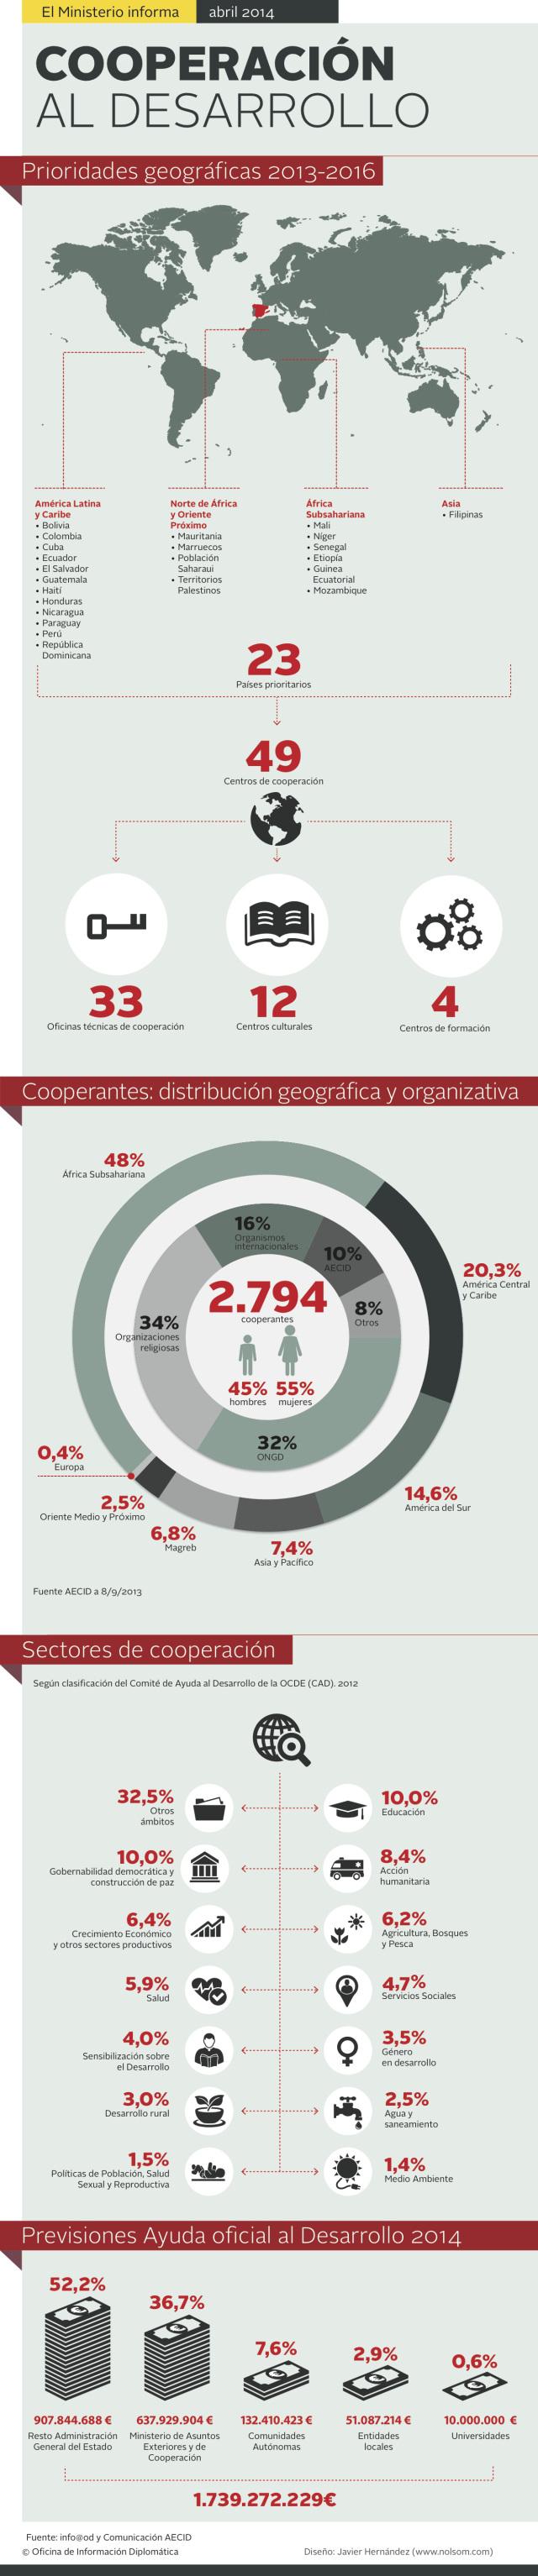 infografia_cooperacion_al_desarrollo_espana